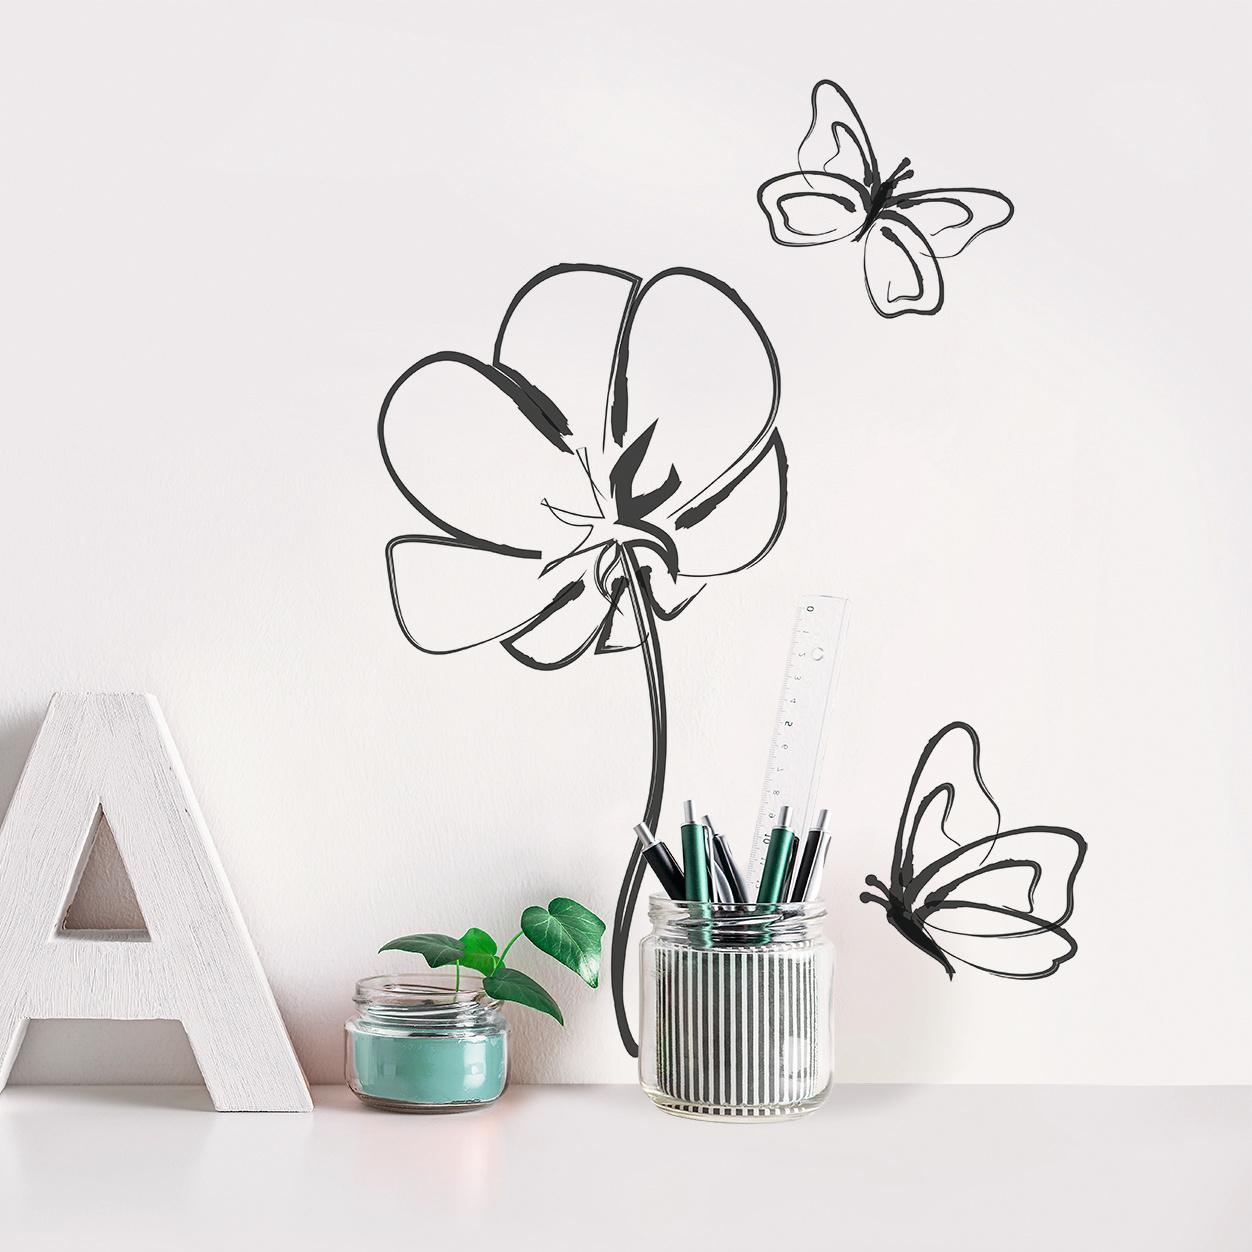 Transfert_Flower_2